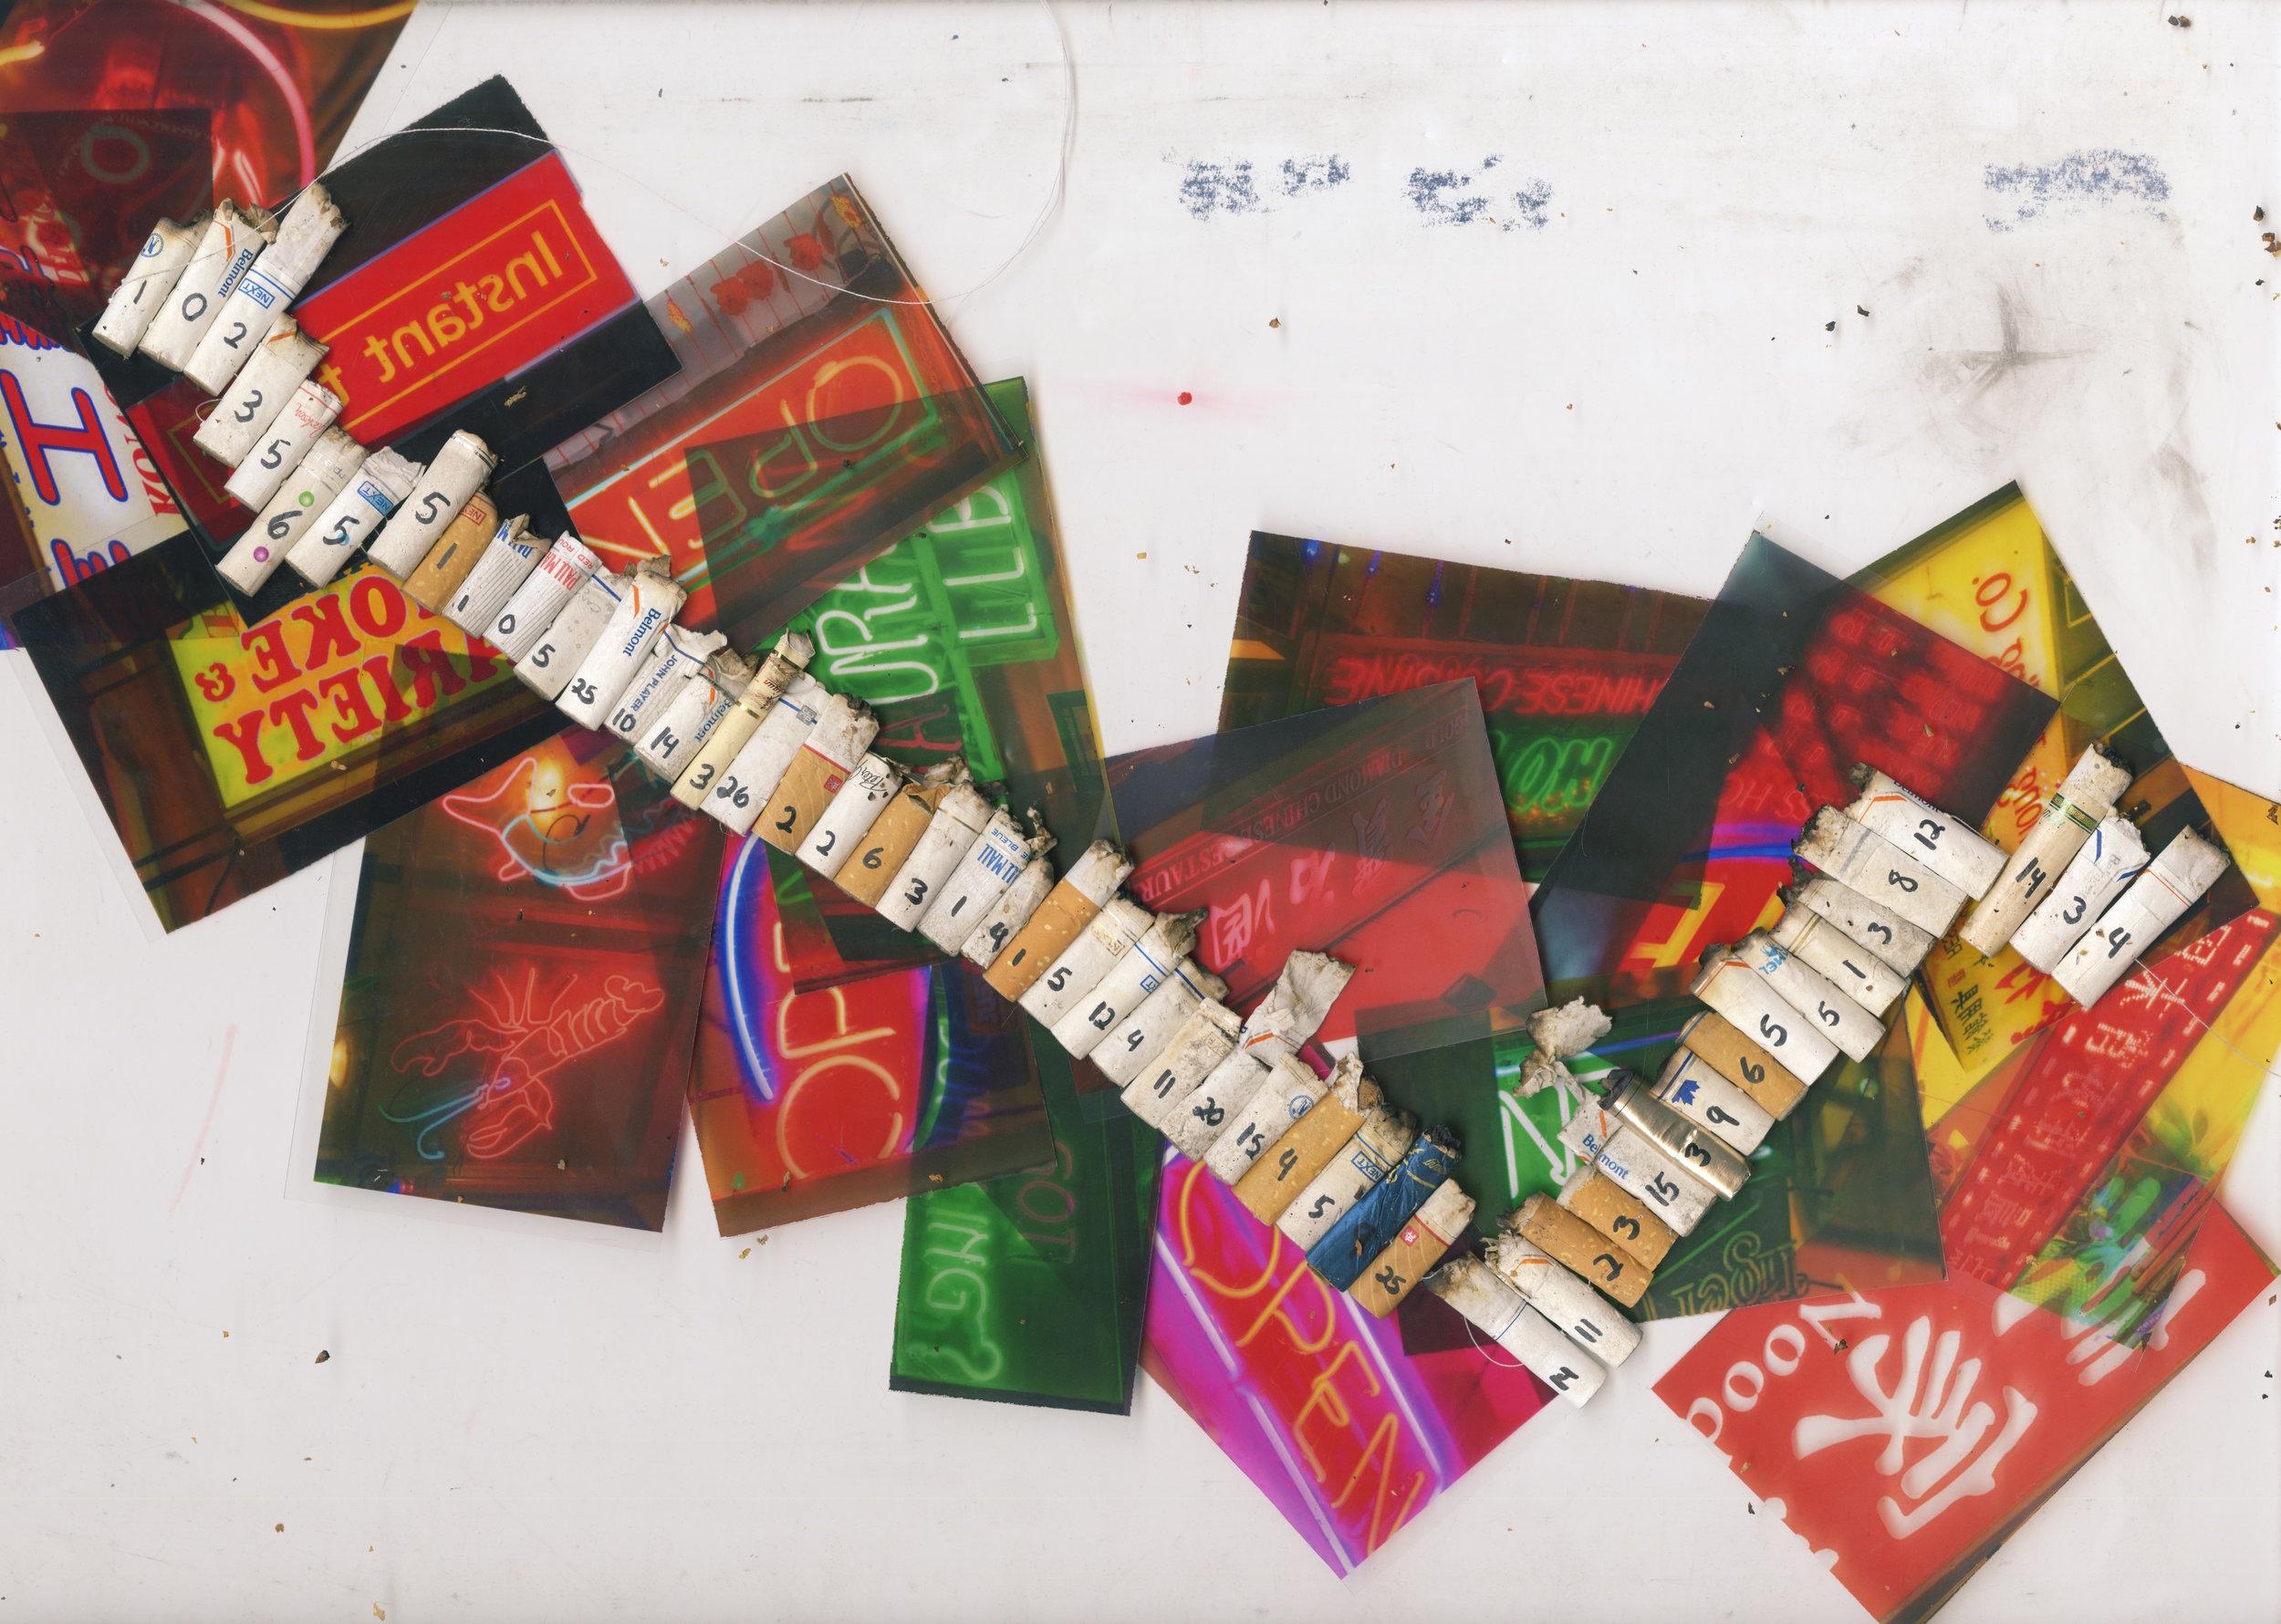 Jan 23rd chinatown scans 10.jpeg